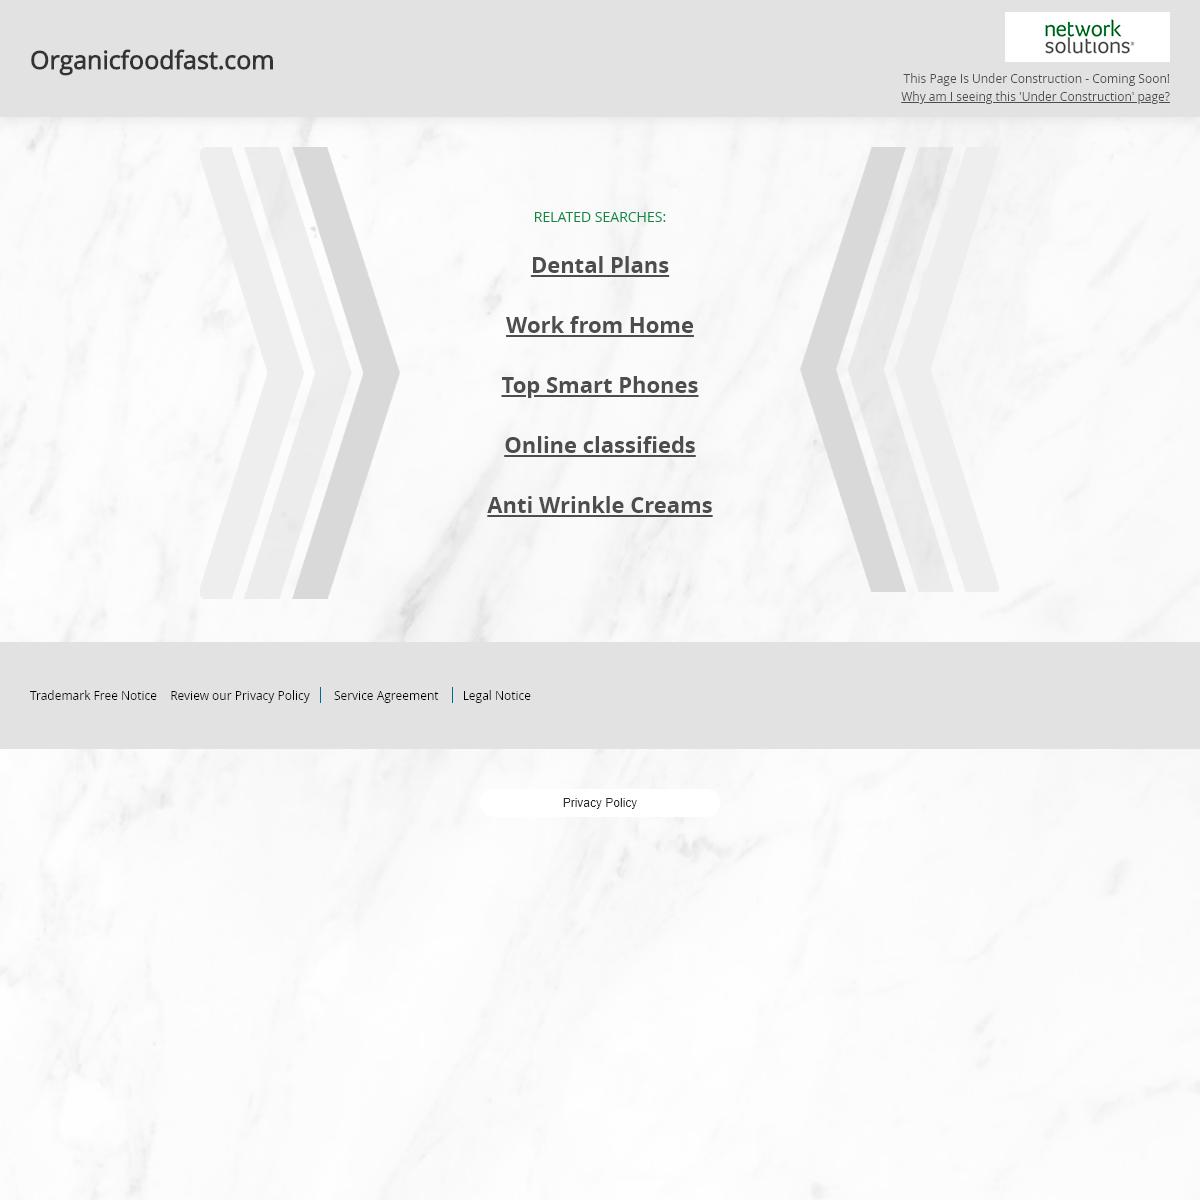 Organicfoodfast.com